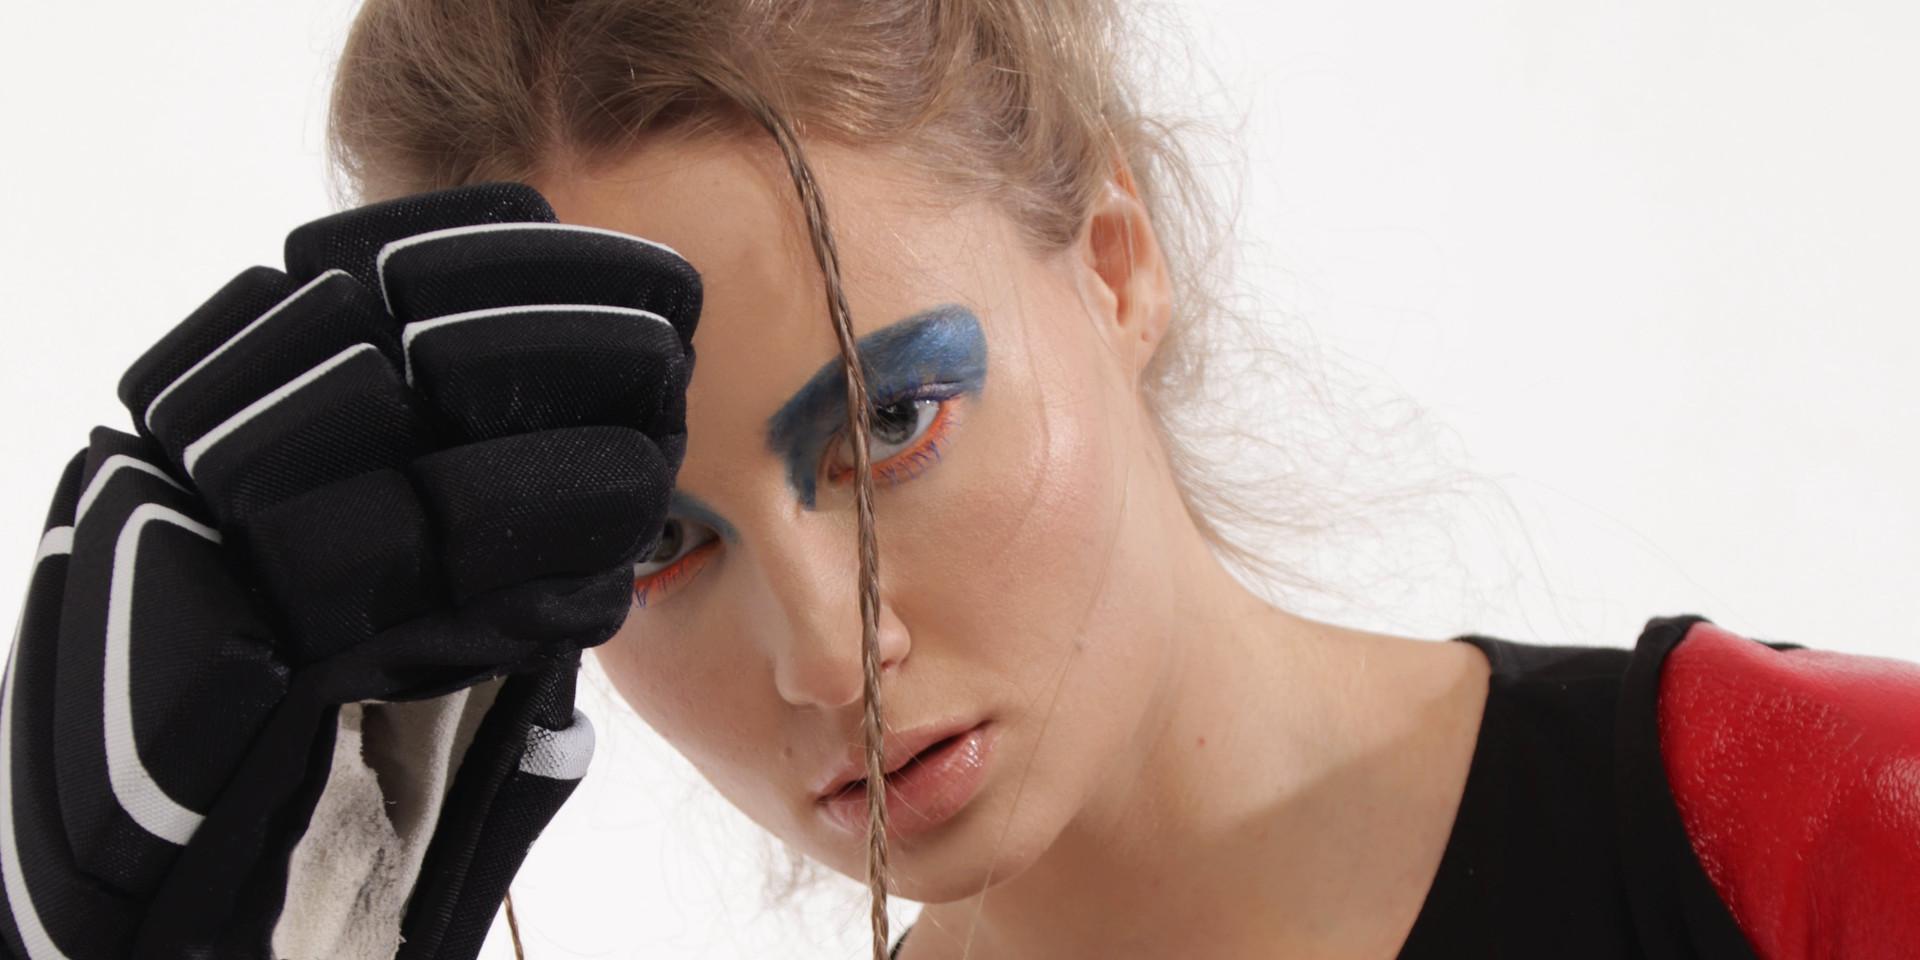 Art director Ossetrova Eugeniya